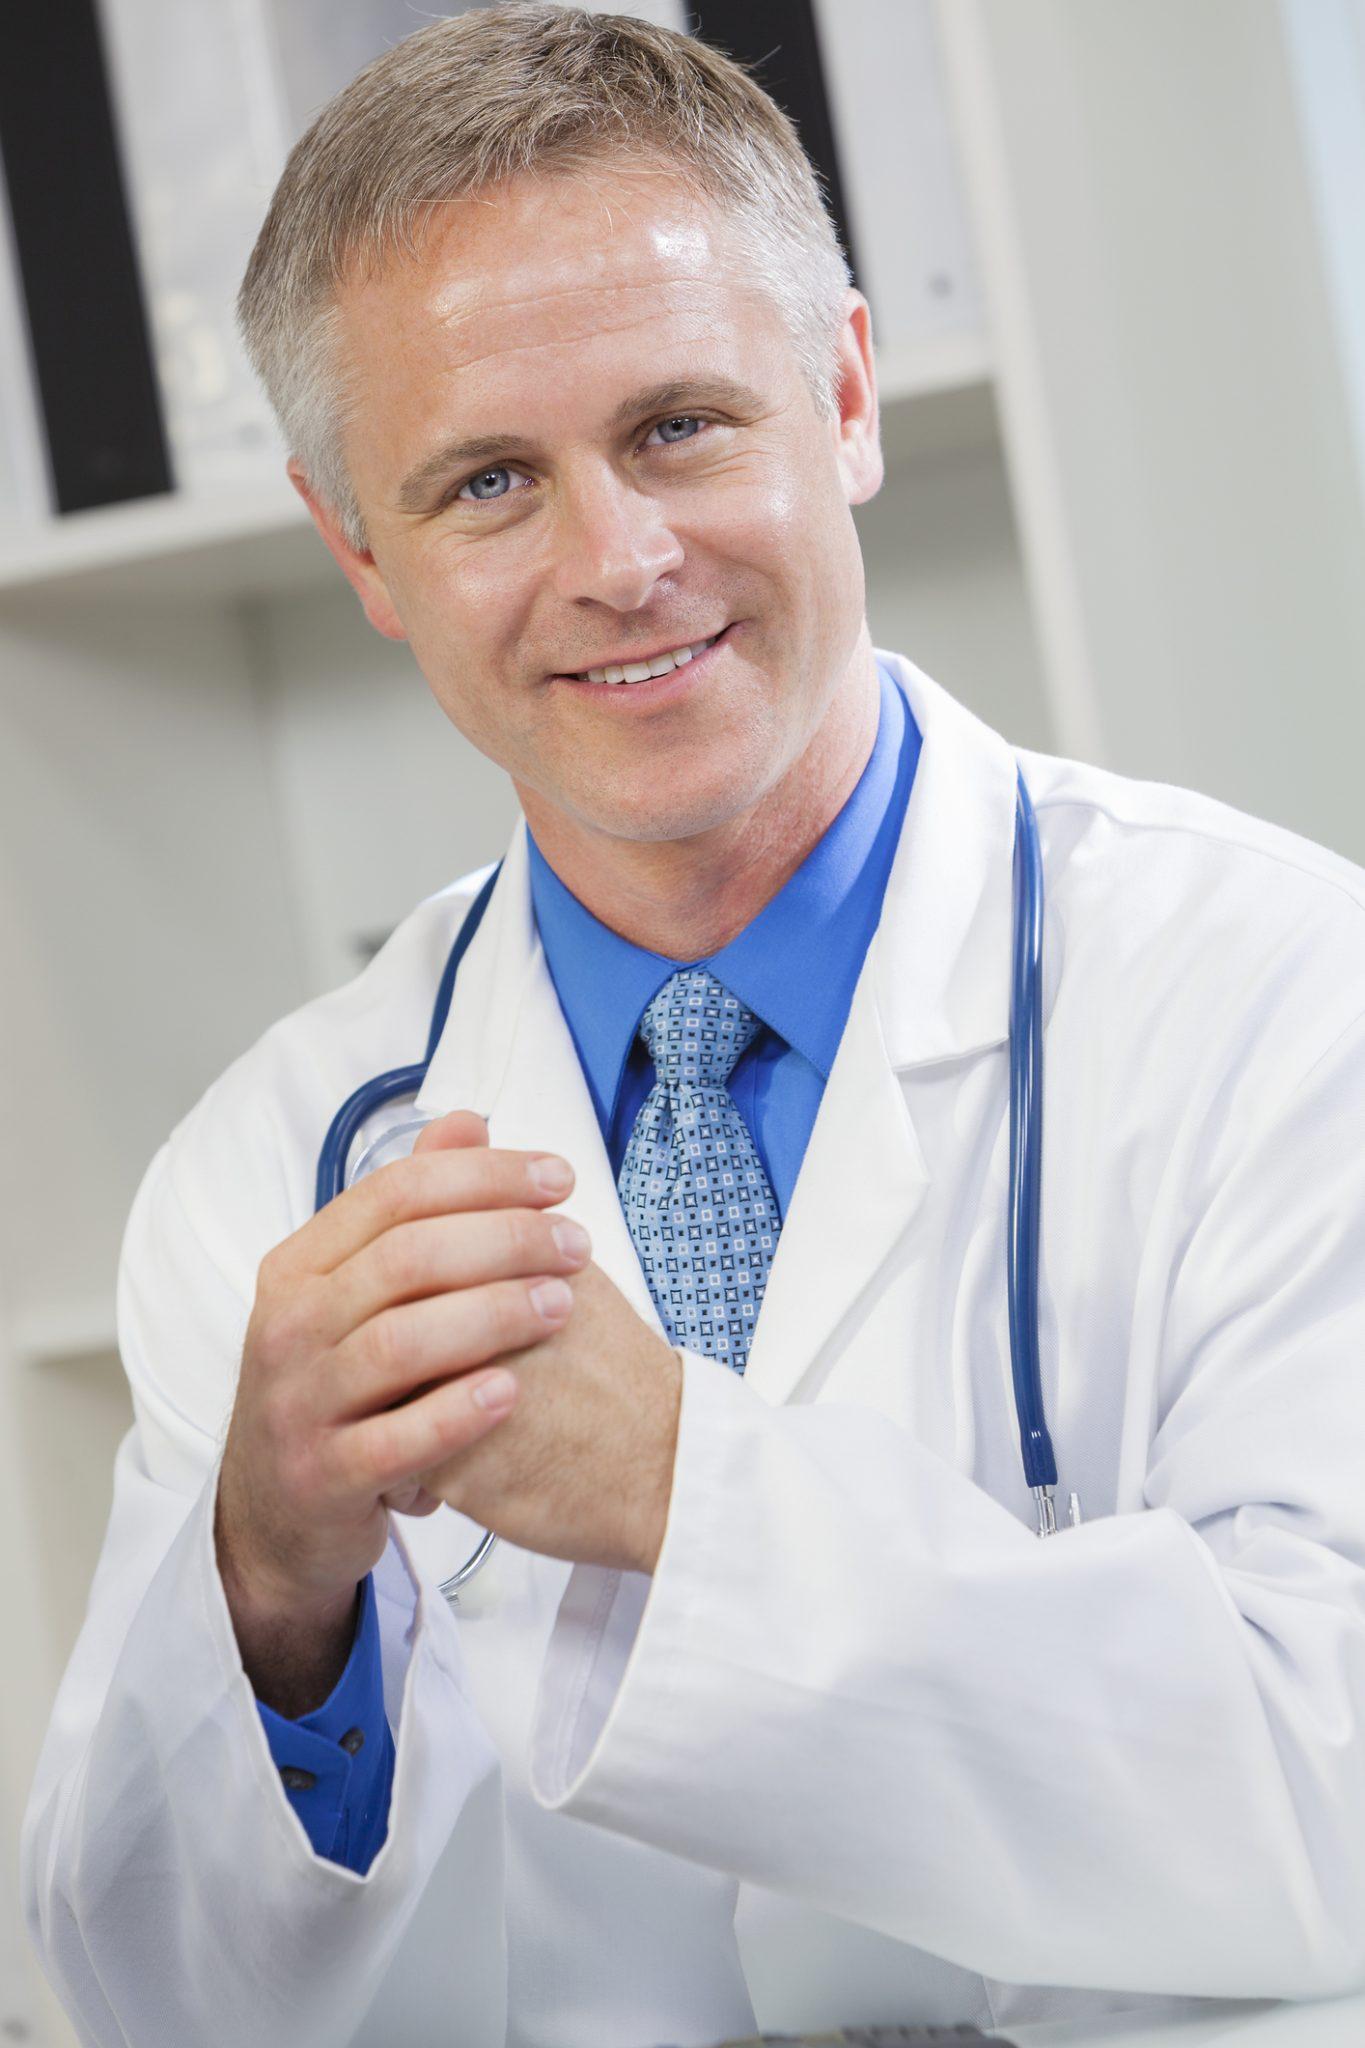 Dr. Brian Lasner